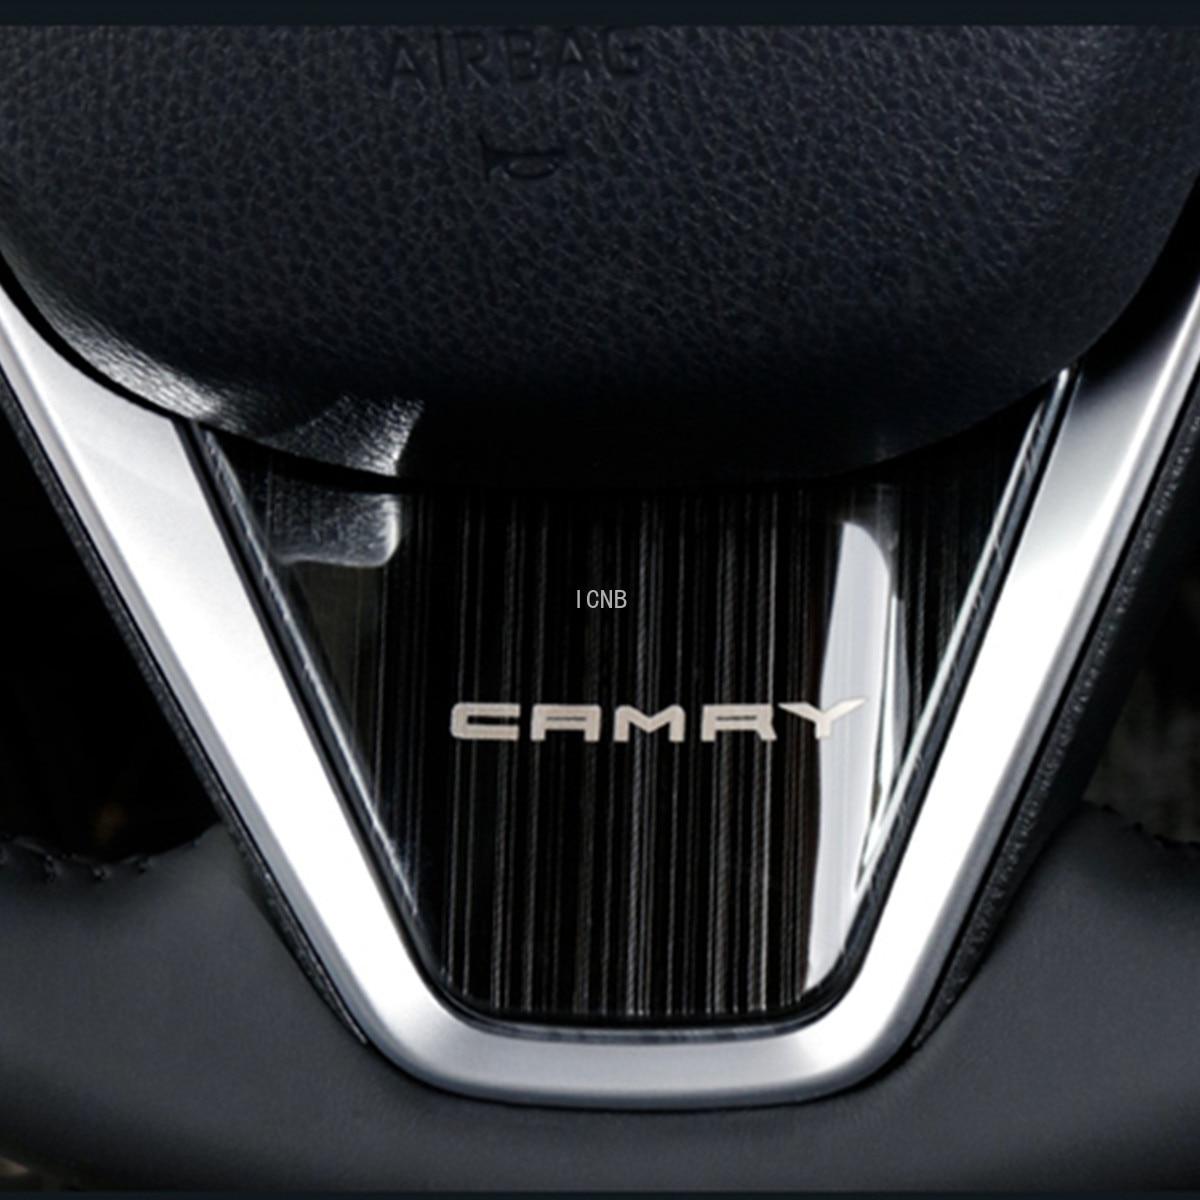 Rvs Stuurwiel Decoratieve Sticker Voor Toyota Camry 2018 2019 8th